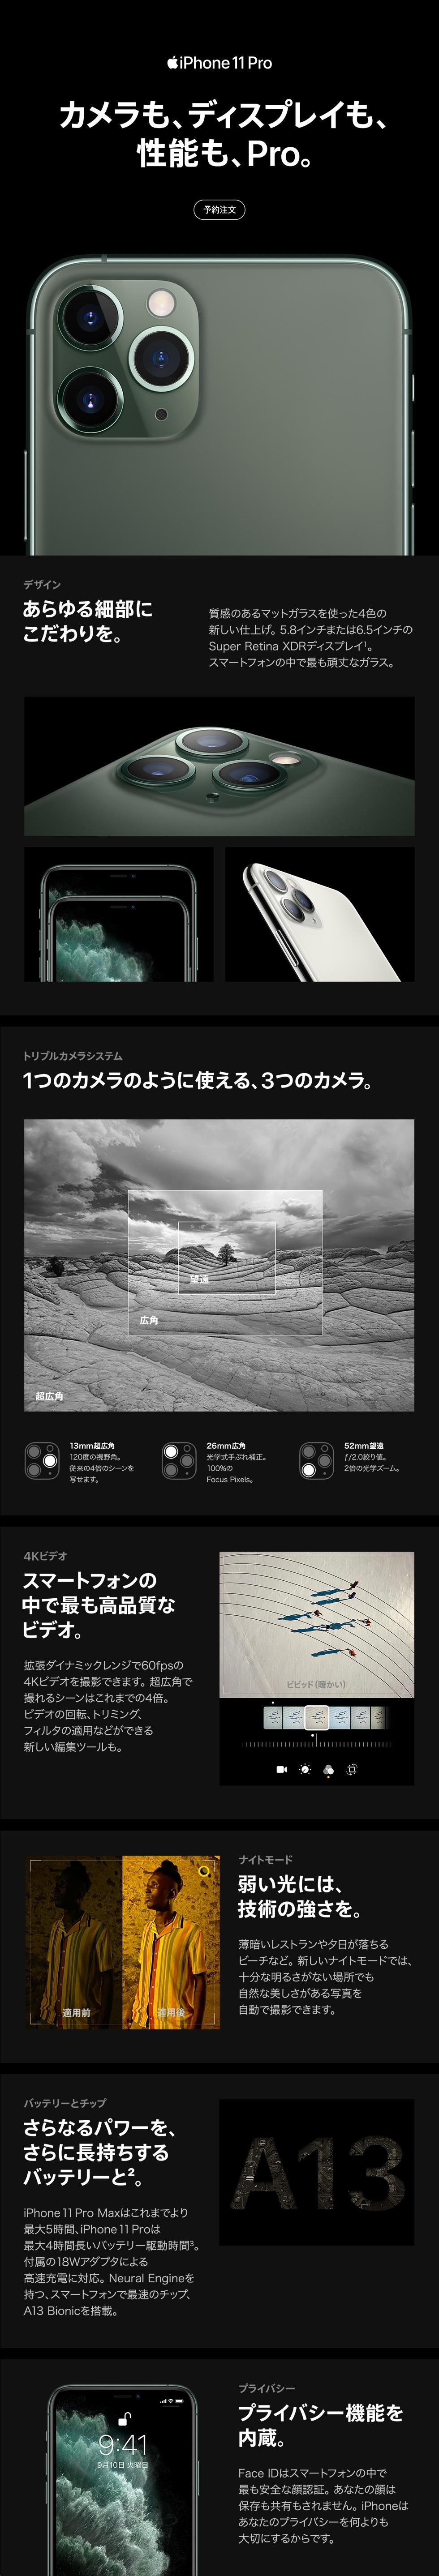 iPhone 11 Pro・iPhone 11 Pro Max